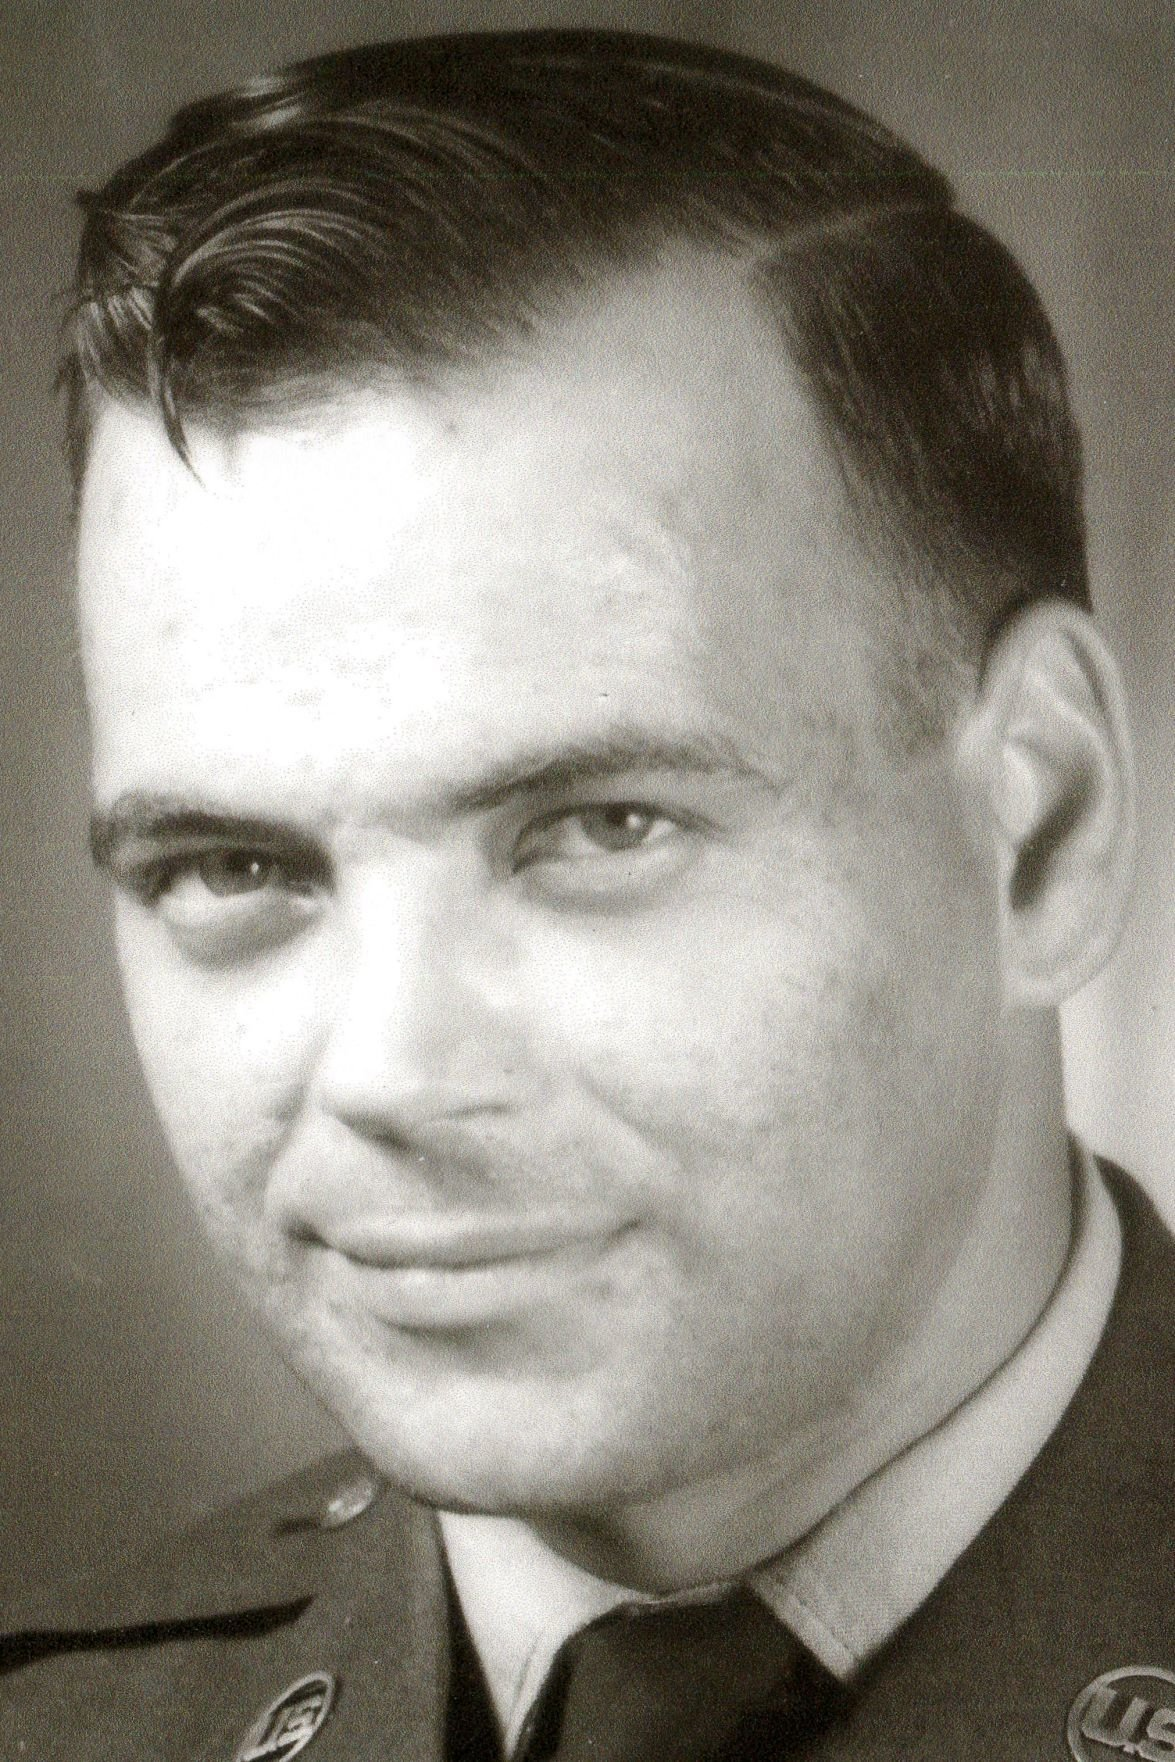 T/Sgt. Stephan Lance Nesja